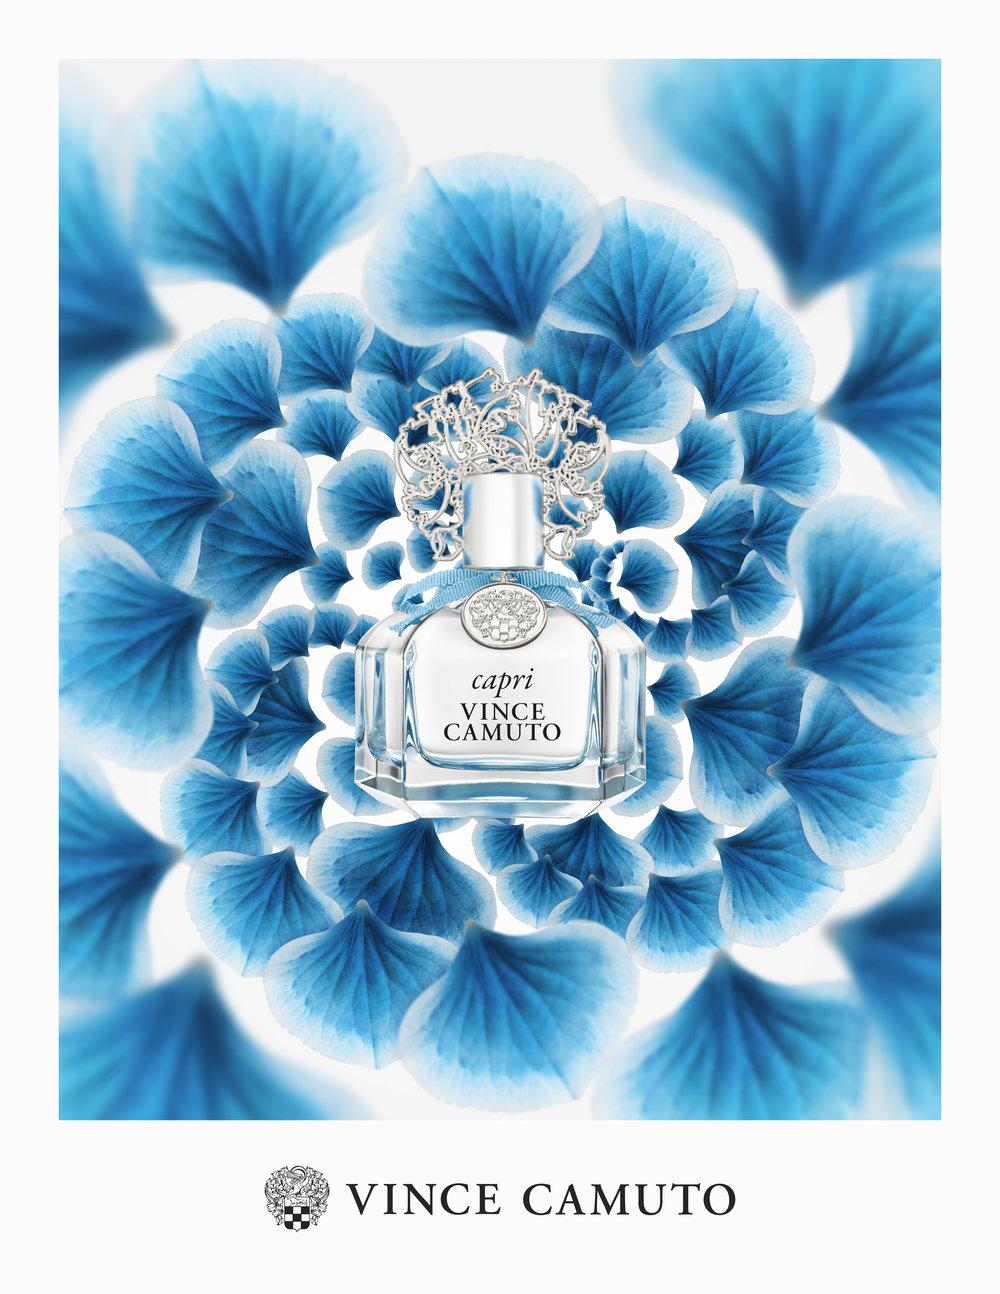 Vince-Camuto-Capri-Fragrance-Ad-by-Timothy-Hogan_MF copy.jpg